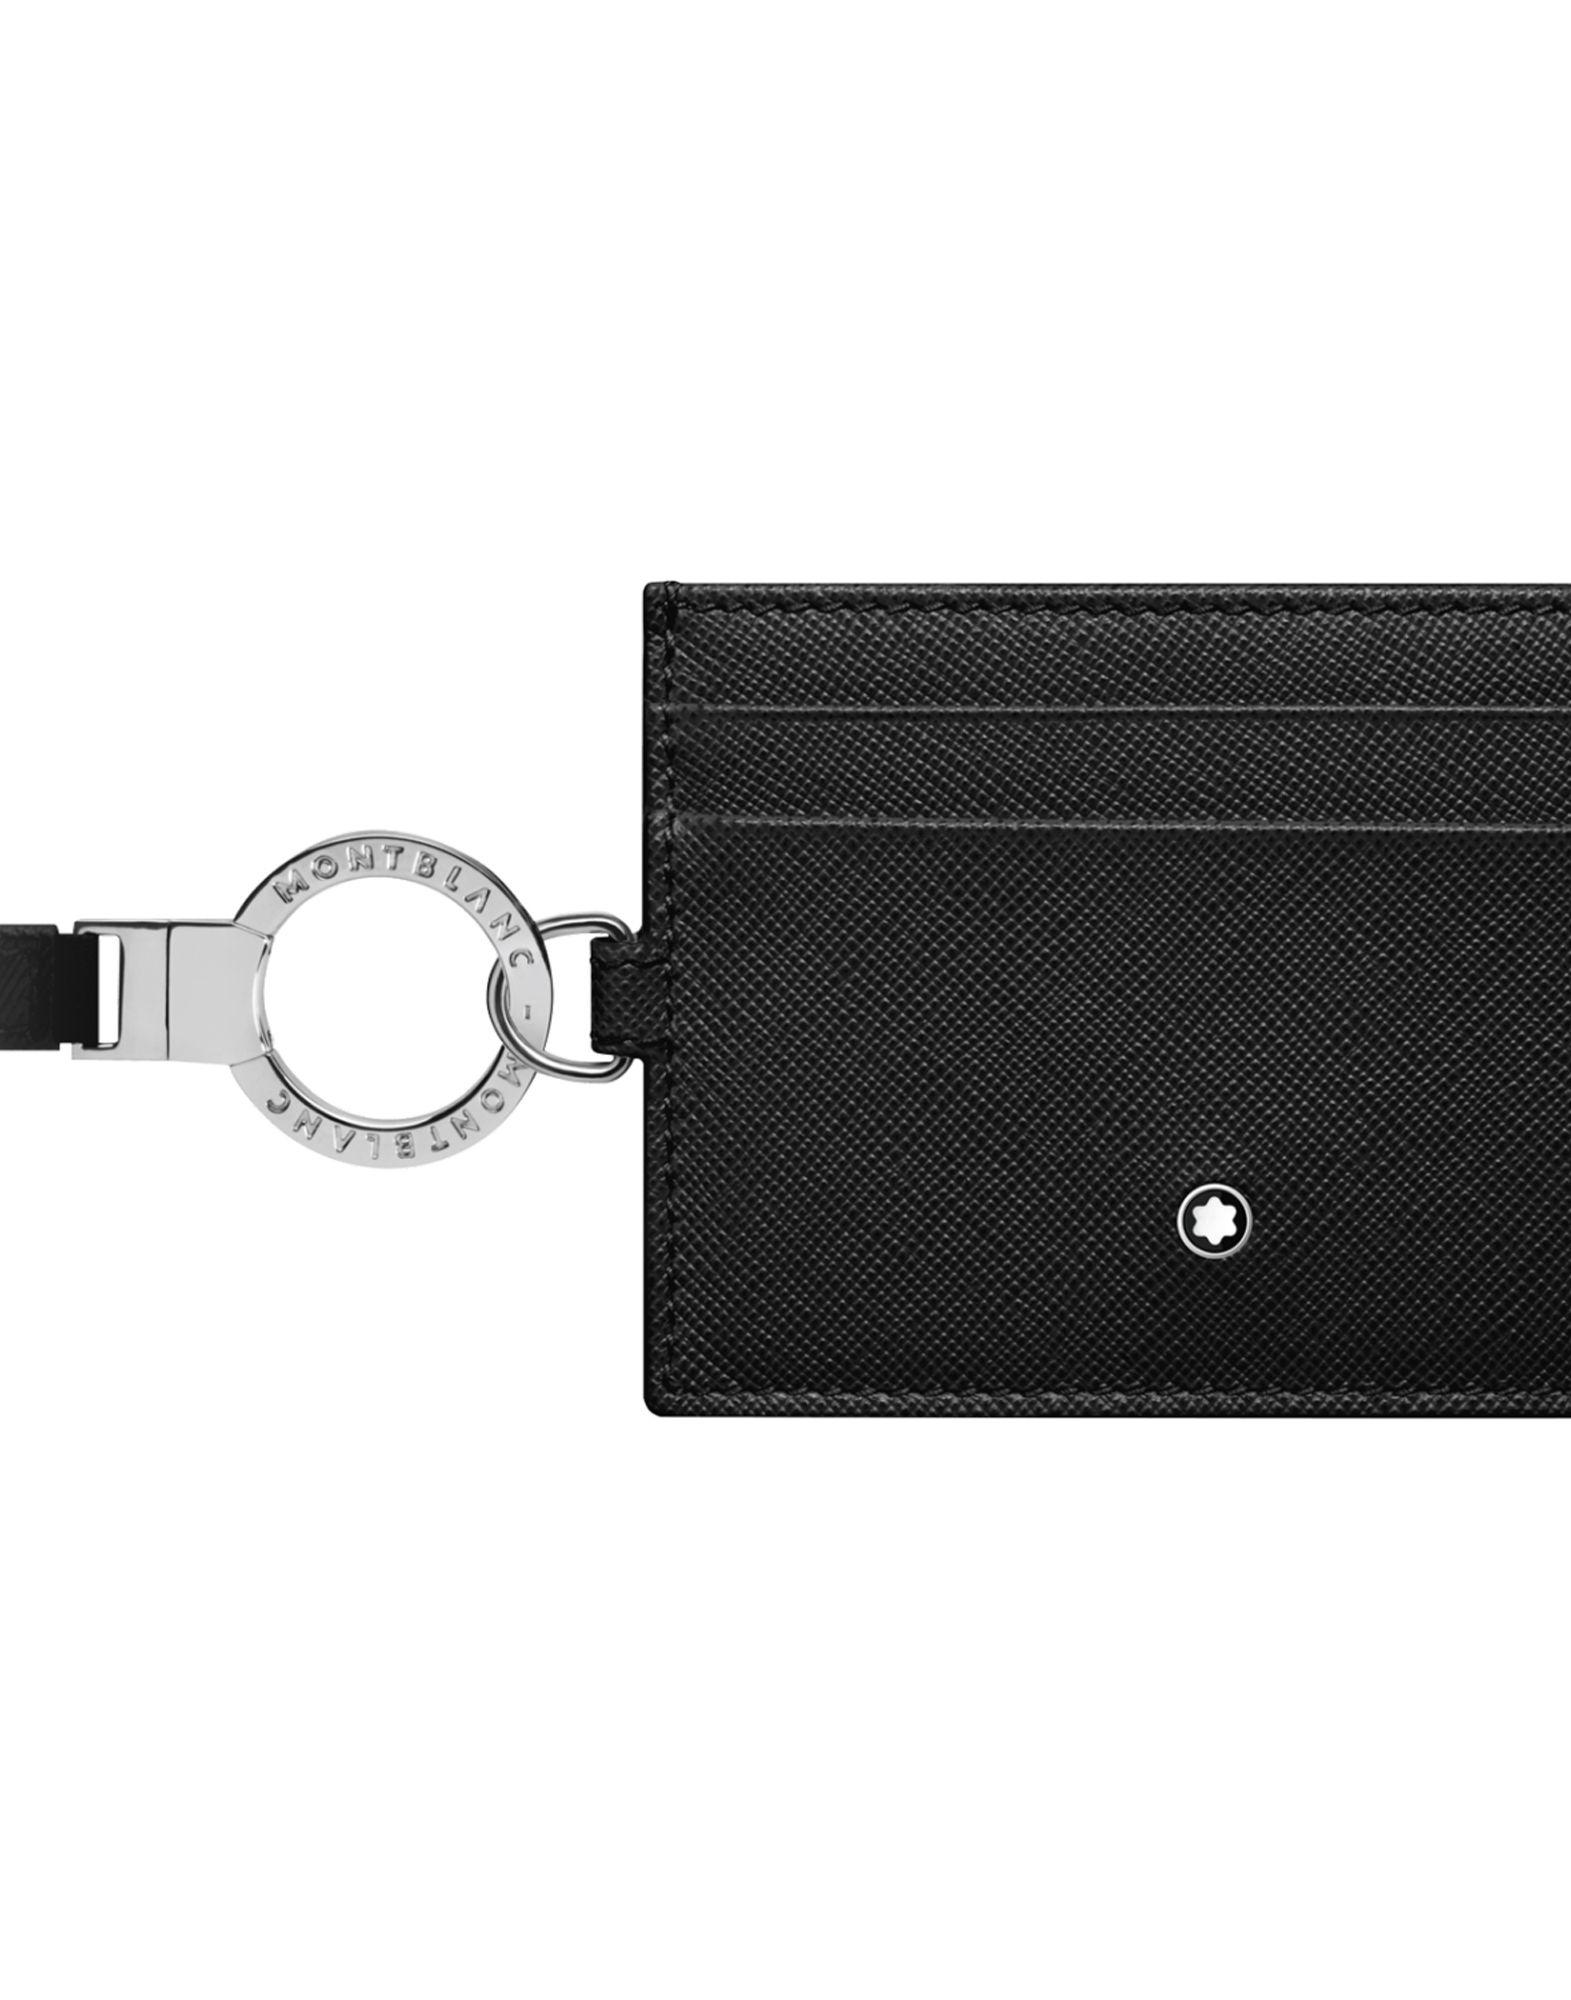 Portadocumenti Montblanc Sartorial Pocket 2Cc With View Carry Me - Uomo - Acquista online su